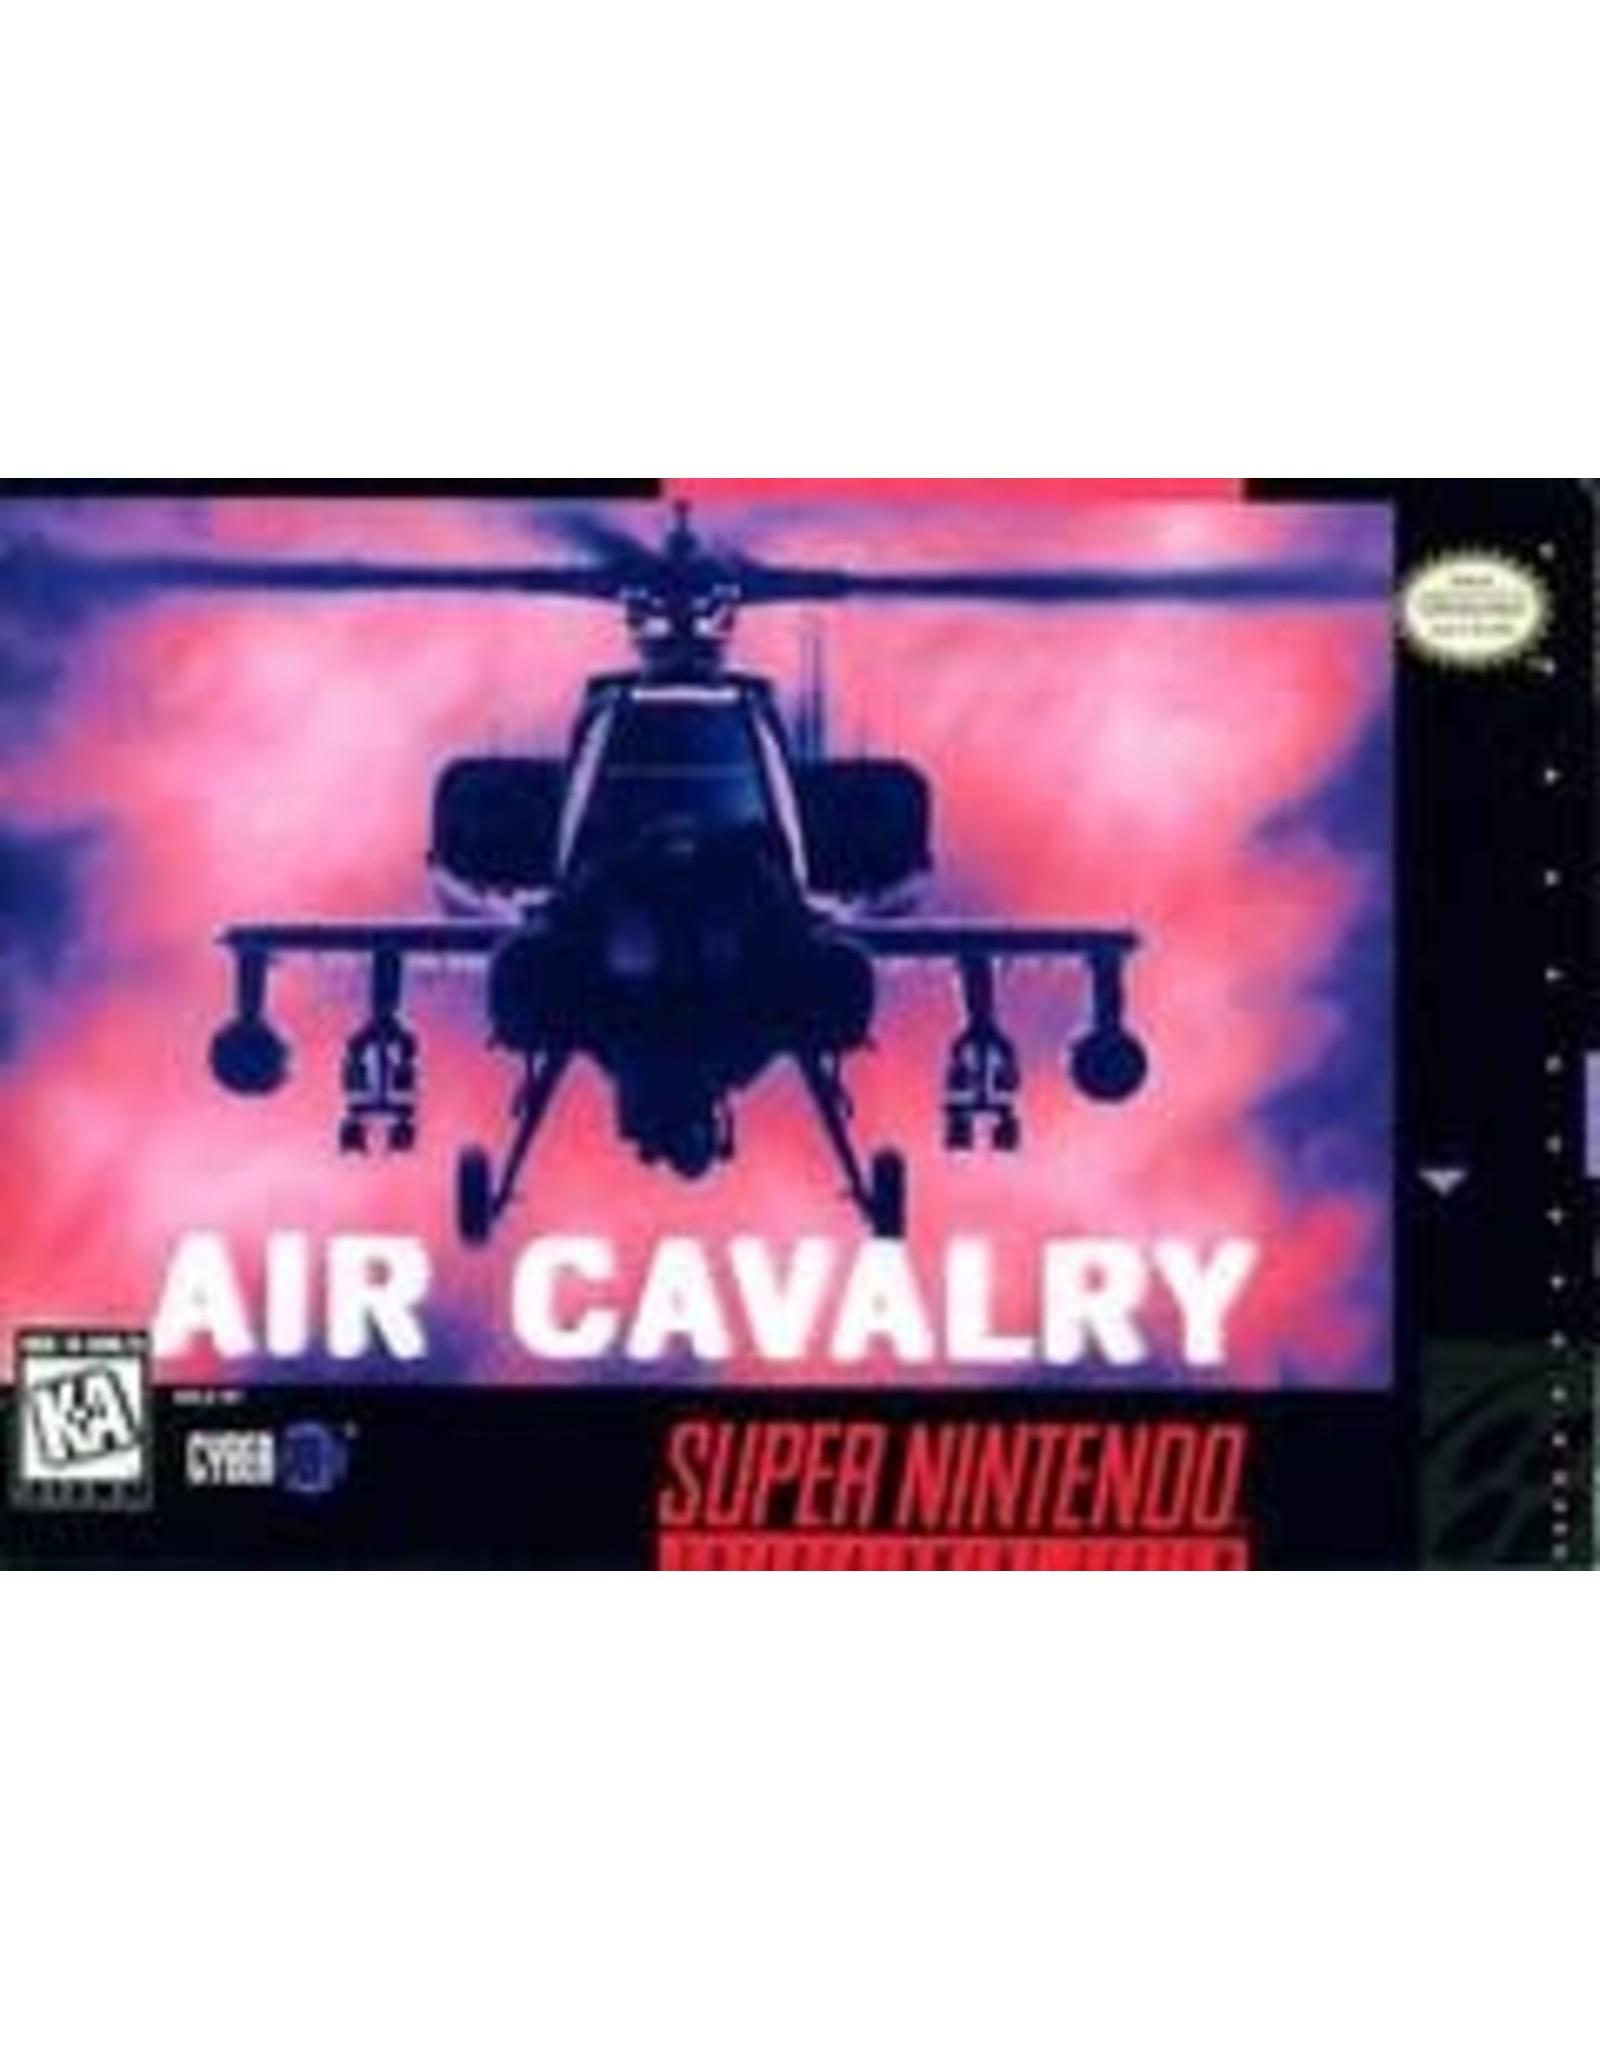 Super Nintendo Air Cavalry (Boxed, No Manual)